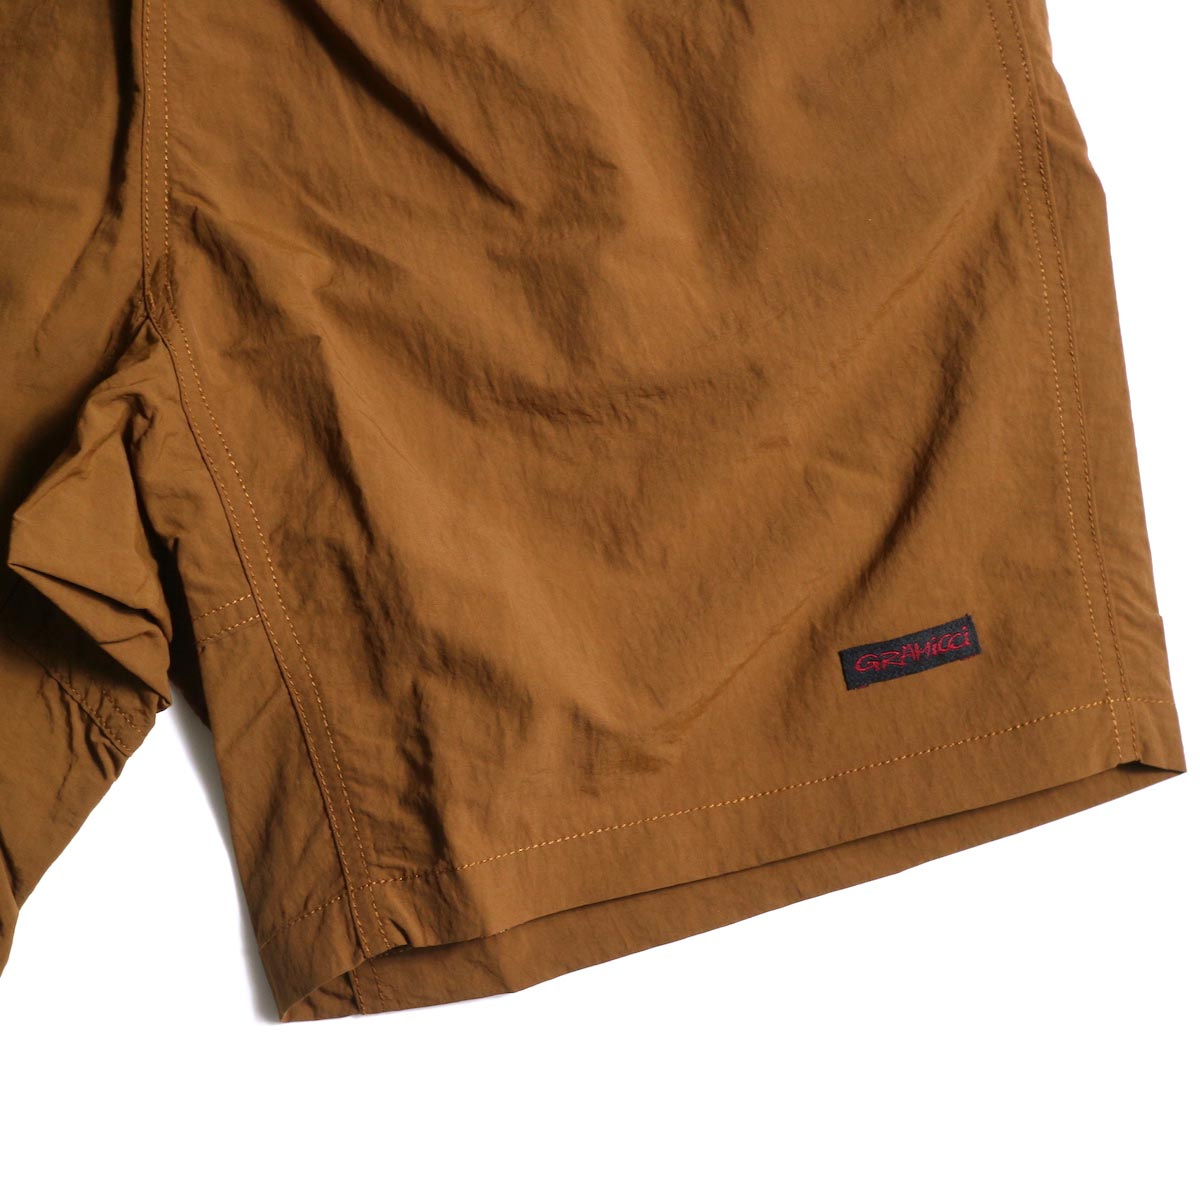 GRAMICCI / Shell Packable Shorts (Mocha)左裾ビスネーム